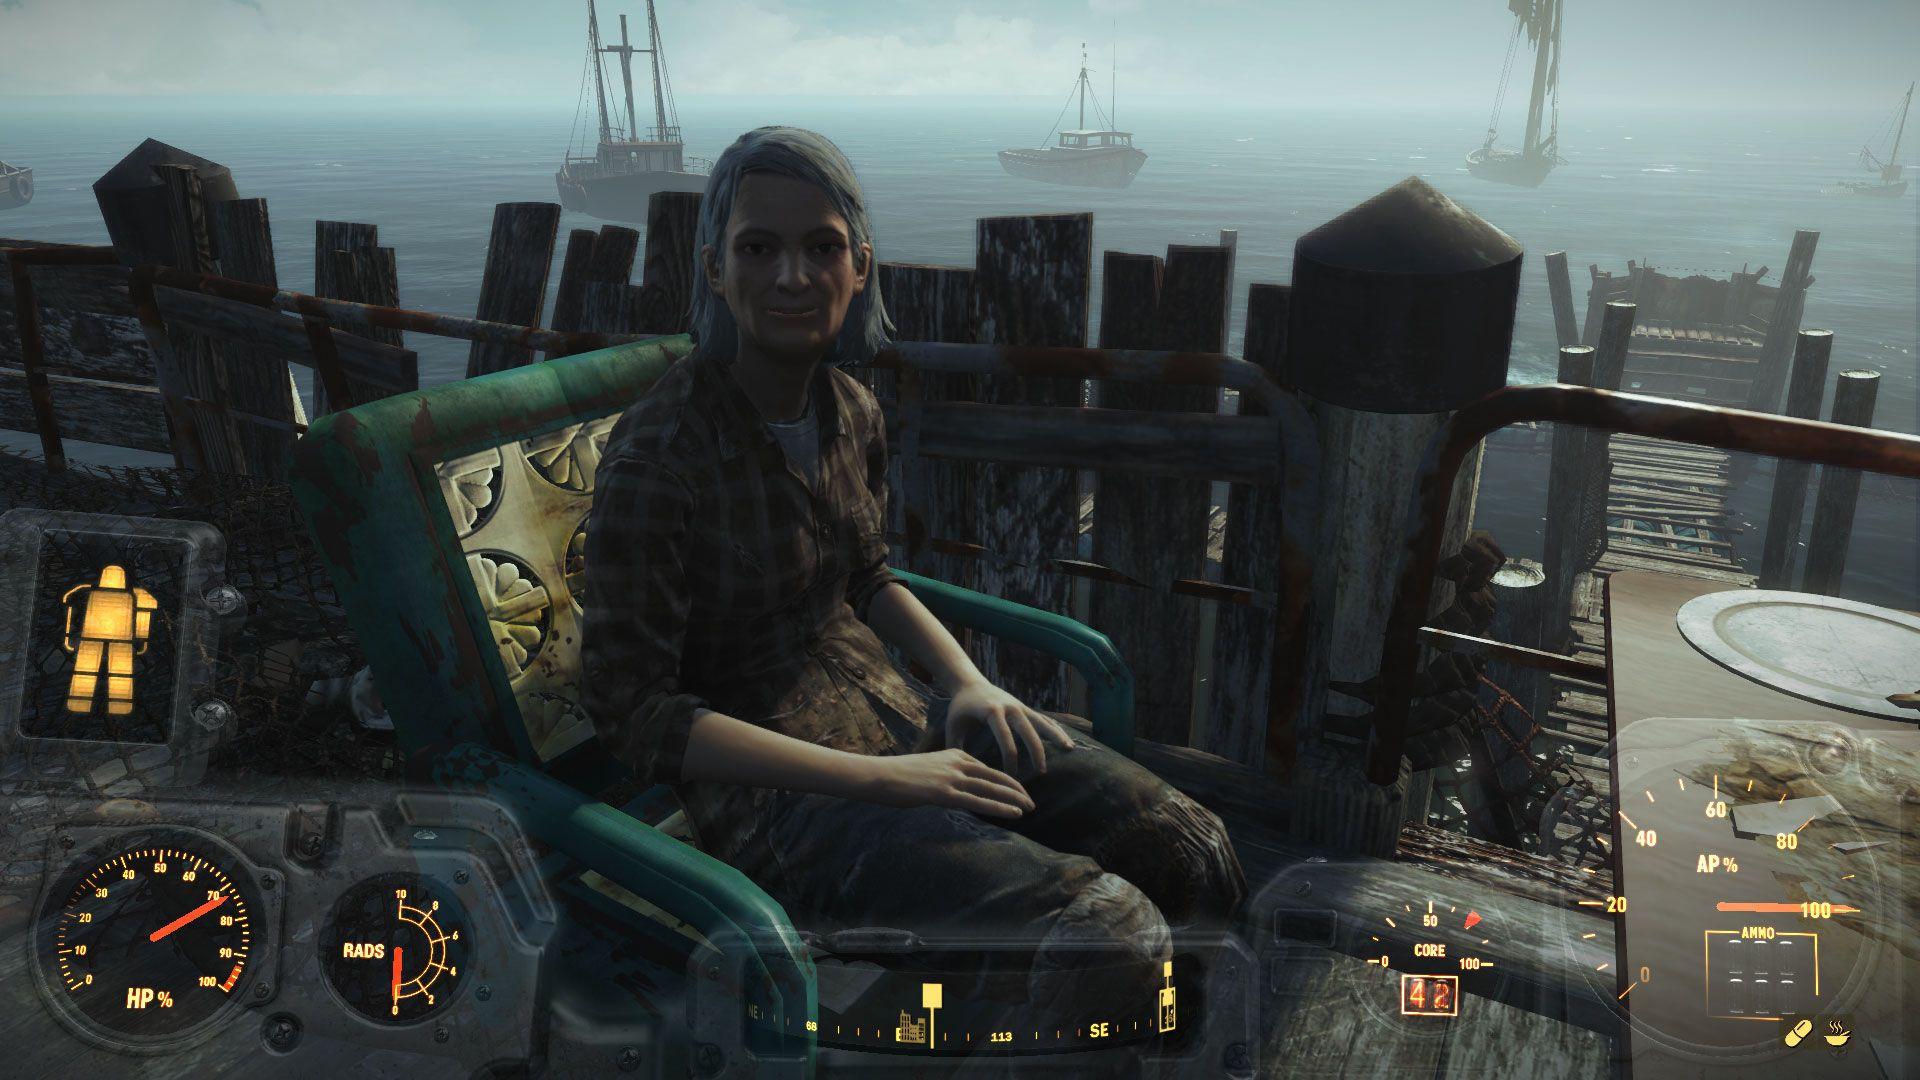 fallout4_far_harbor_ps4_gente_puerto